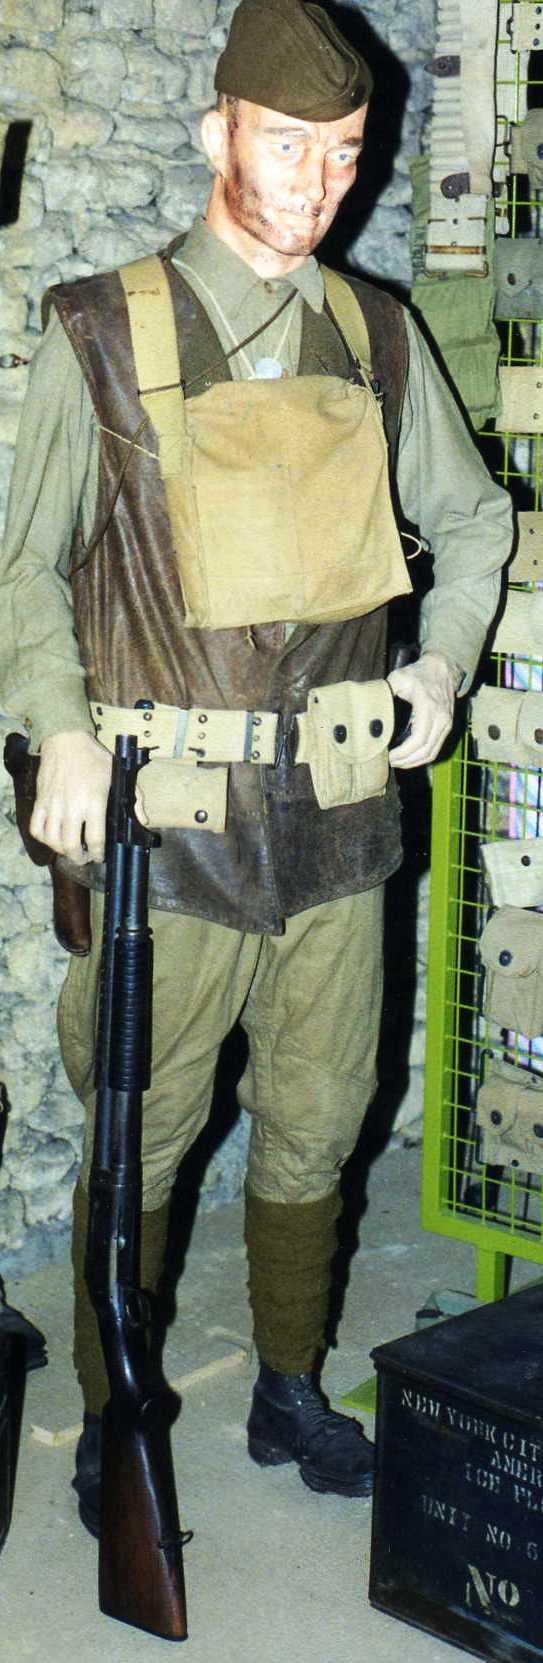 mon trench gun 1897 Collec12